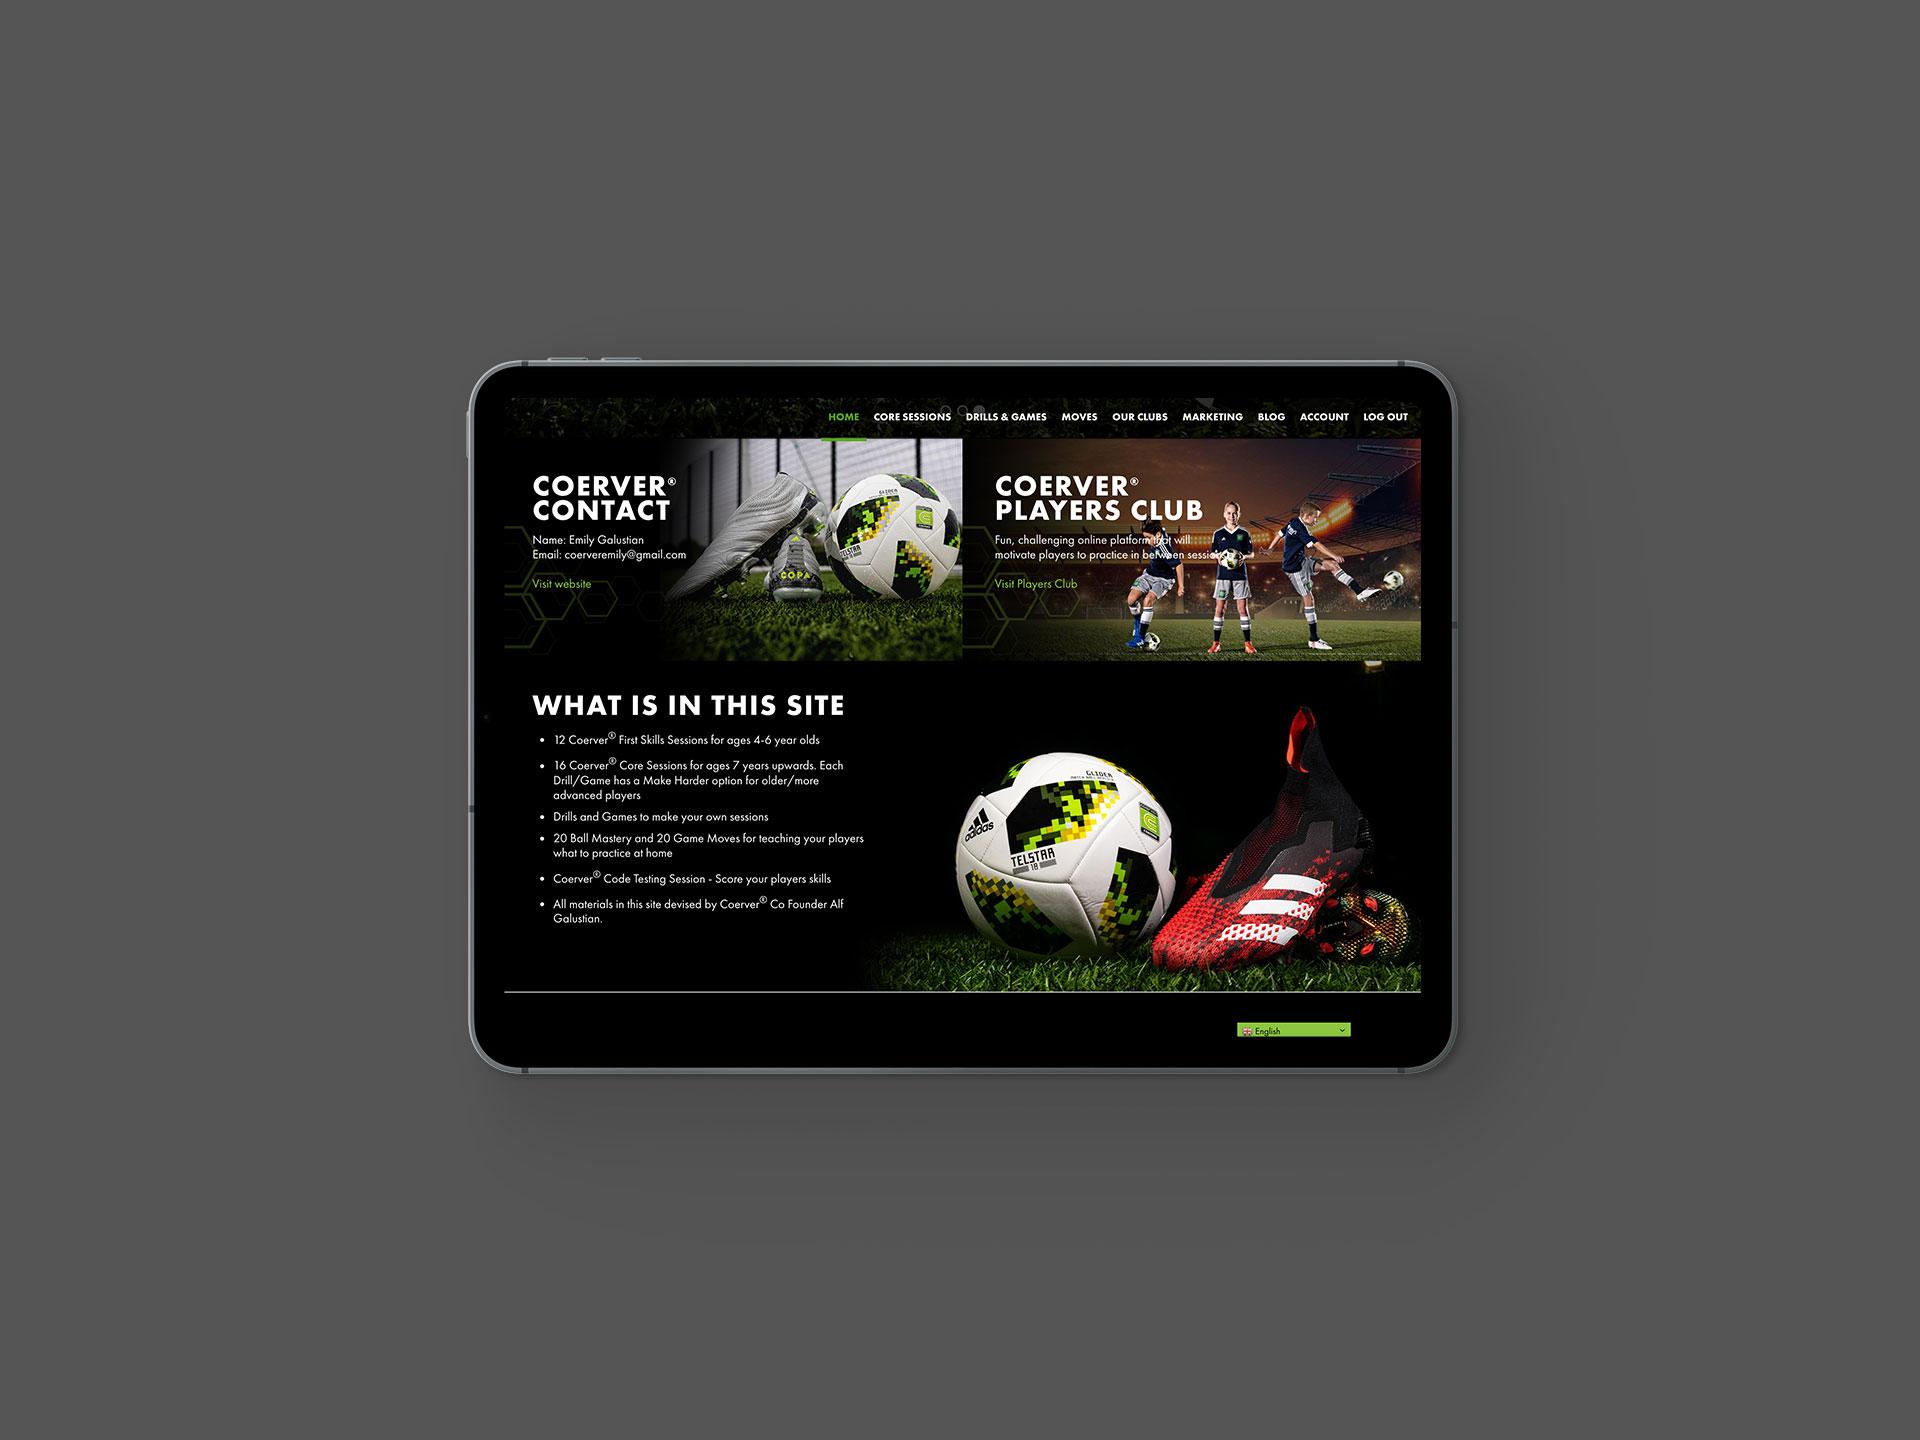 Coerver Partner Club Website Details